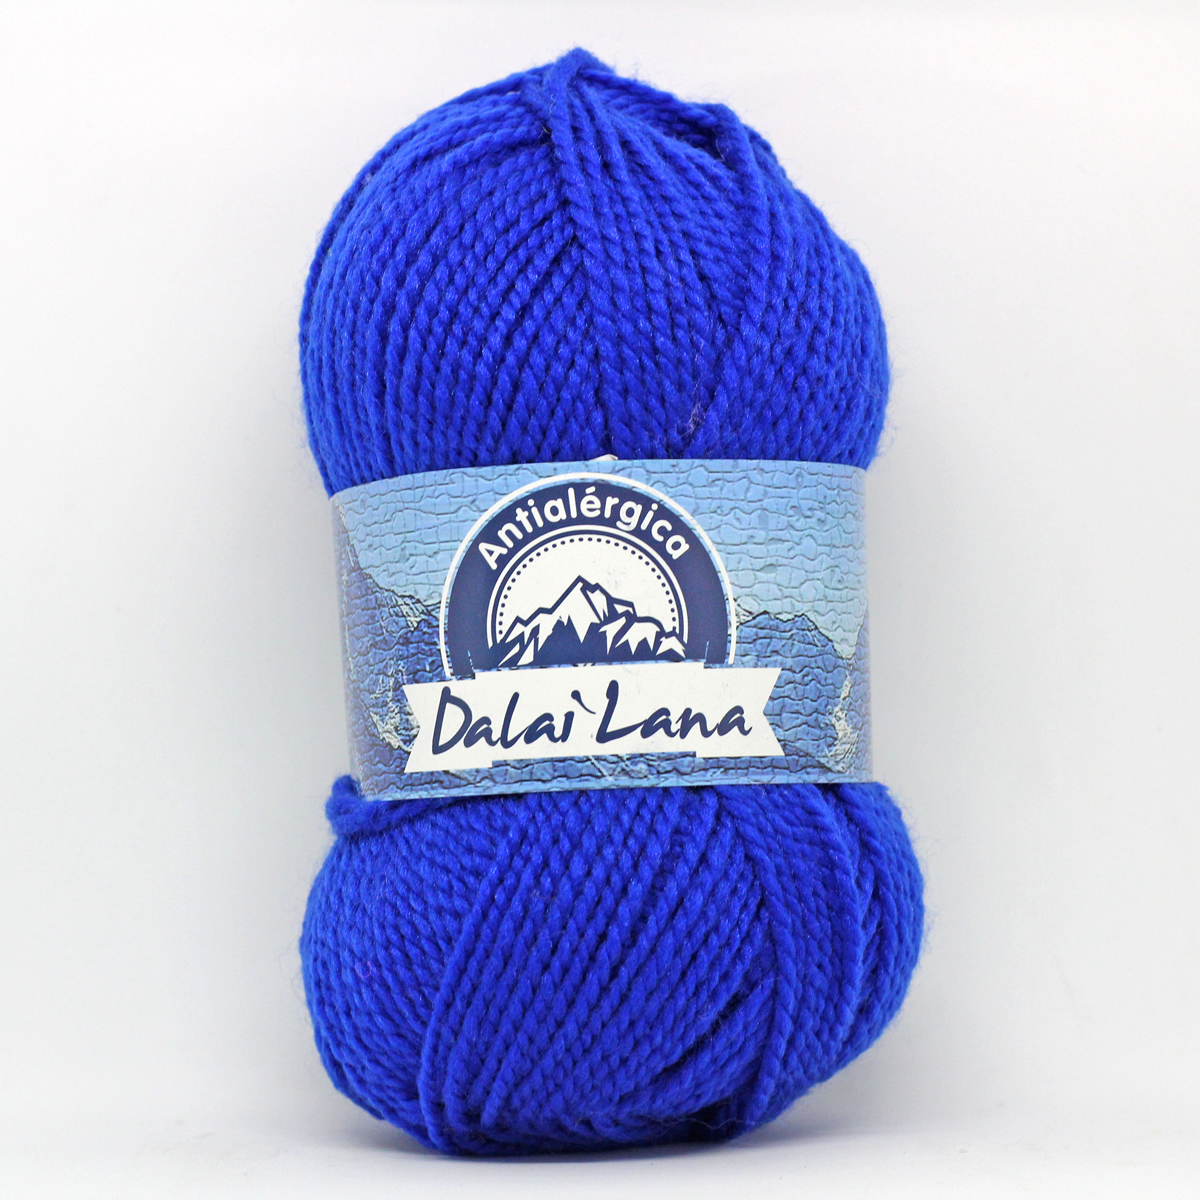 Dalai Lana - 766